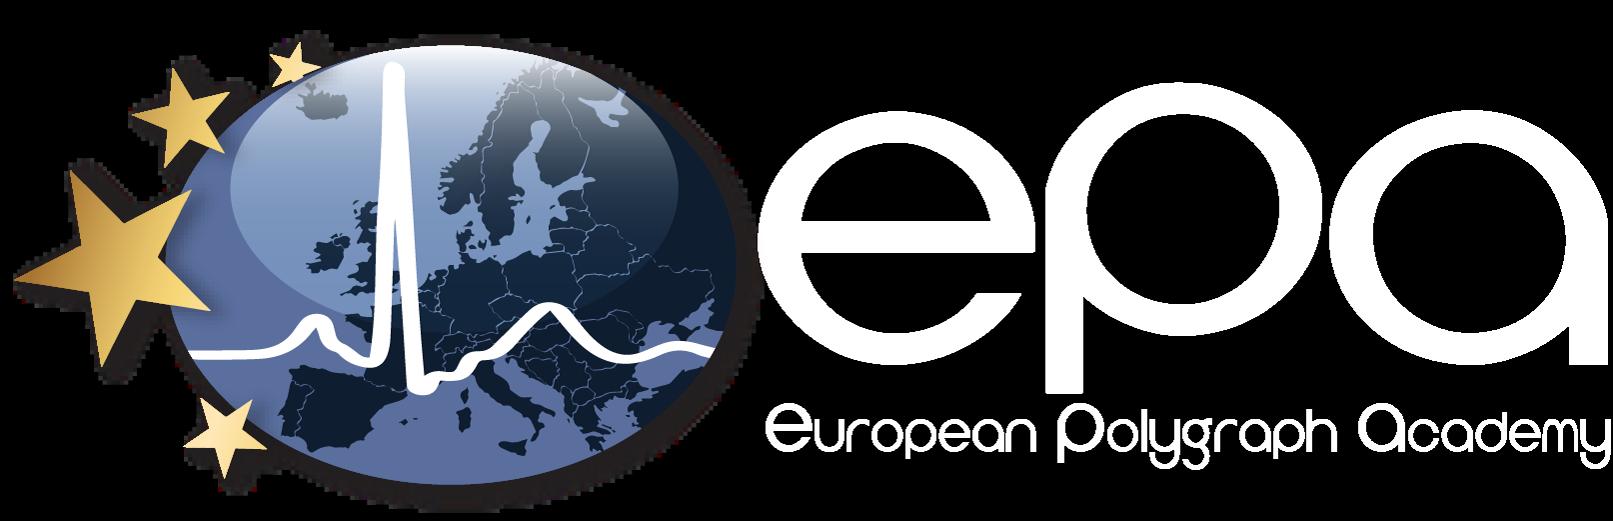 EPA-poligrafo-academia